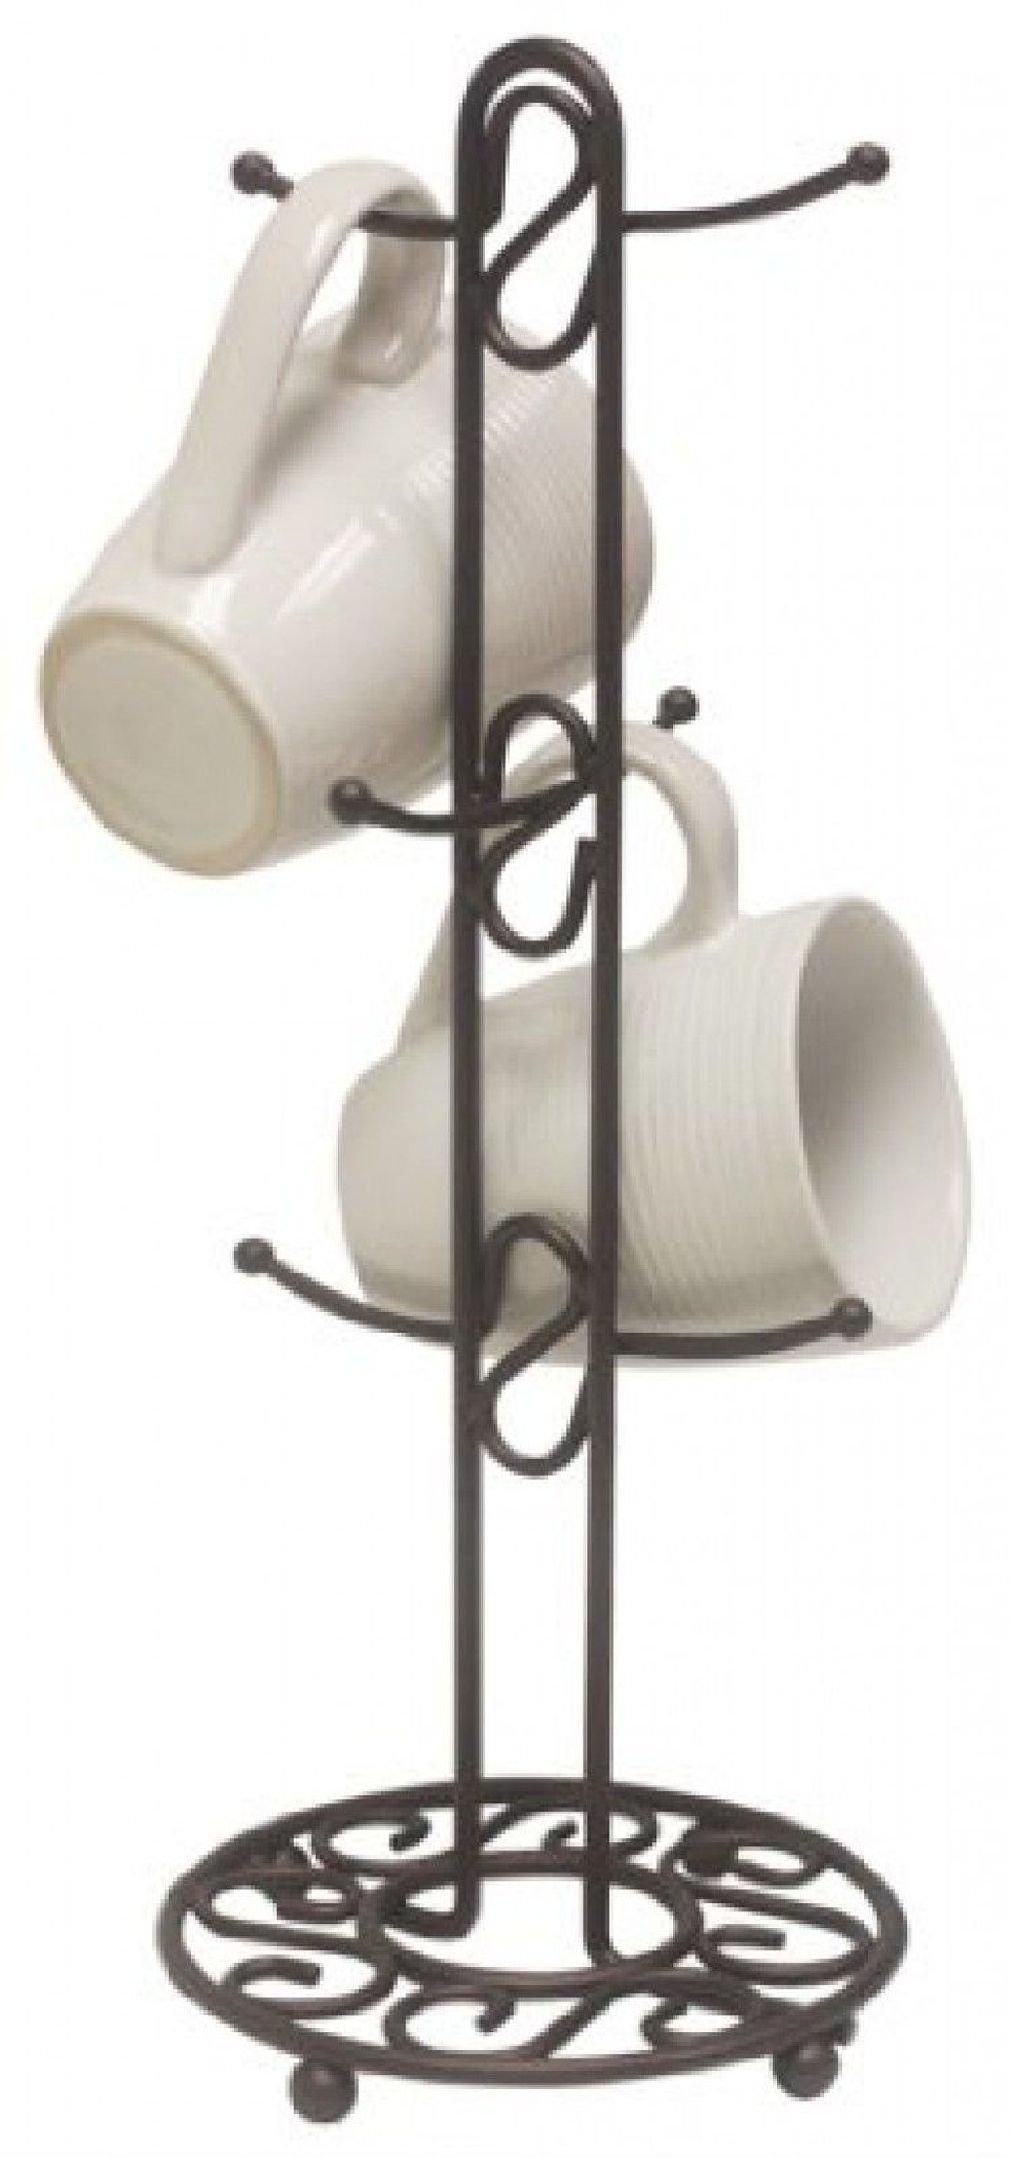 Countertop Coffee Mug/Cup Tree Holder by Home Basics Bronze